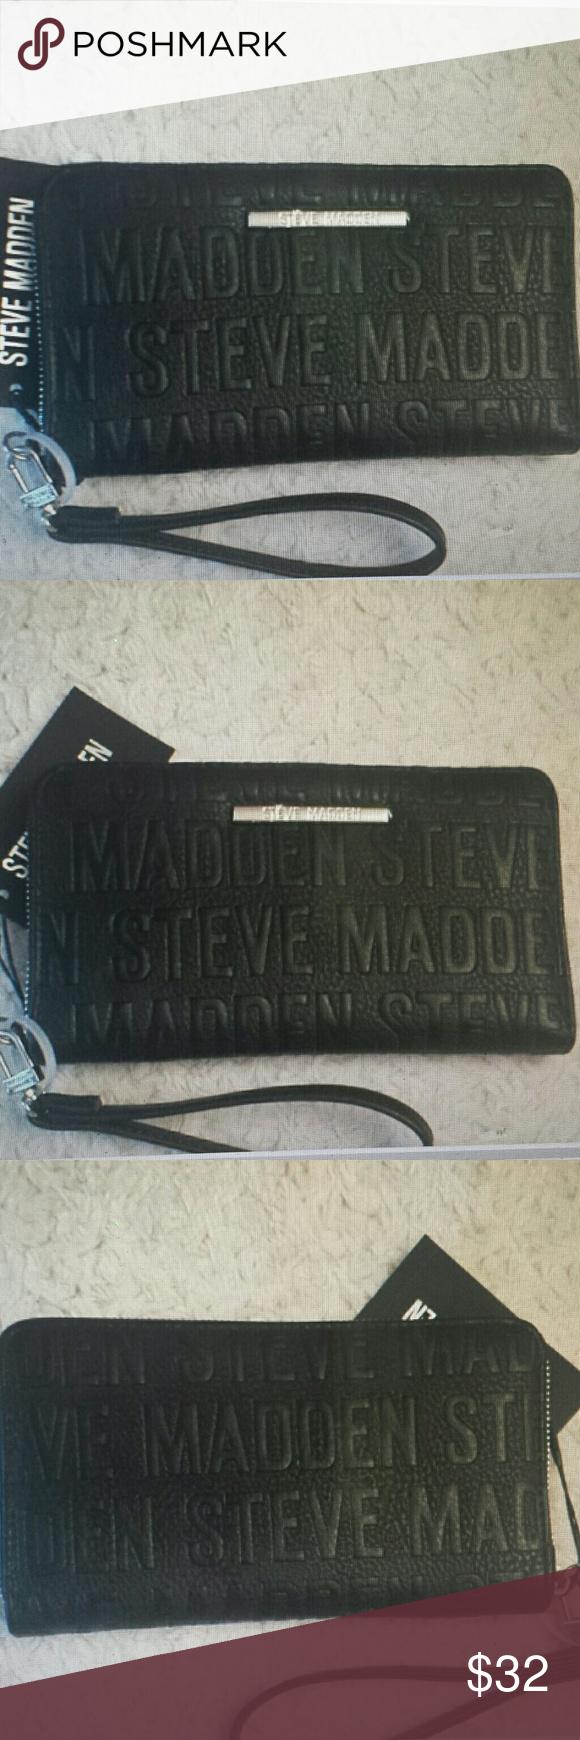 Steve Madden Nwt Black Logo Wristlet And Wallet Black Logo Steve Madden Steve Madden Bags